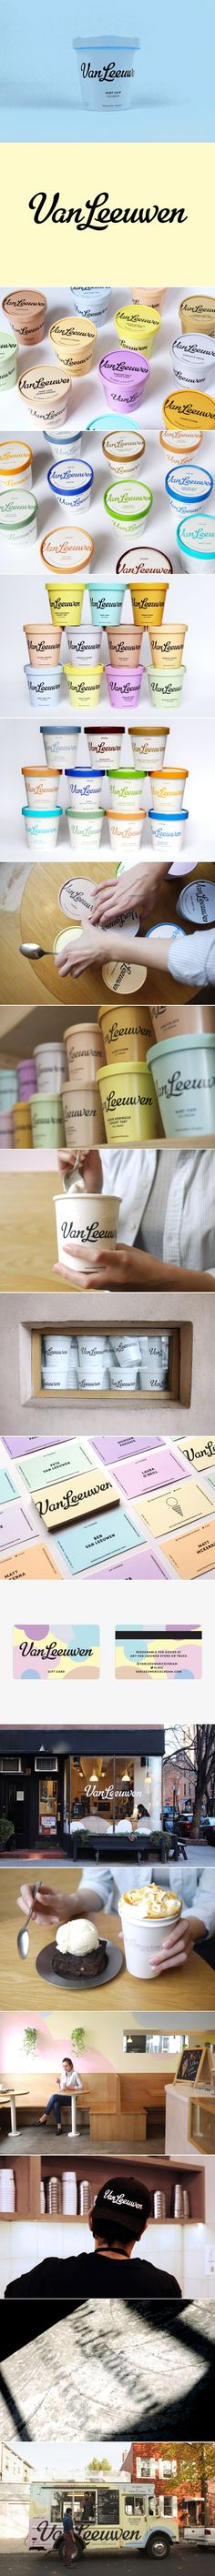 The Graphic, Gorgeous New Look of Van Leeuwen Artisan Ice Cream — The Dieline | Packaging & Branding Design & Innovation News